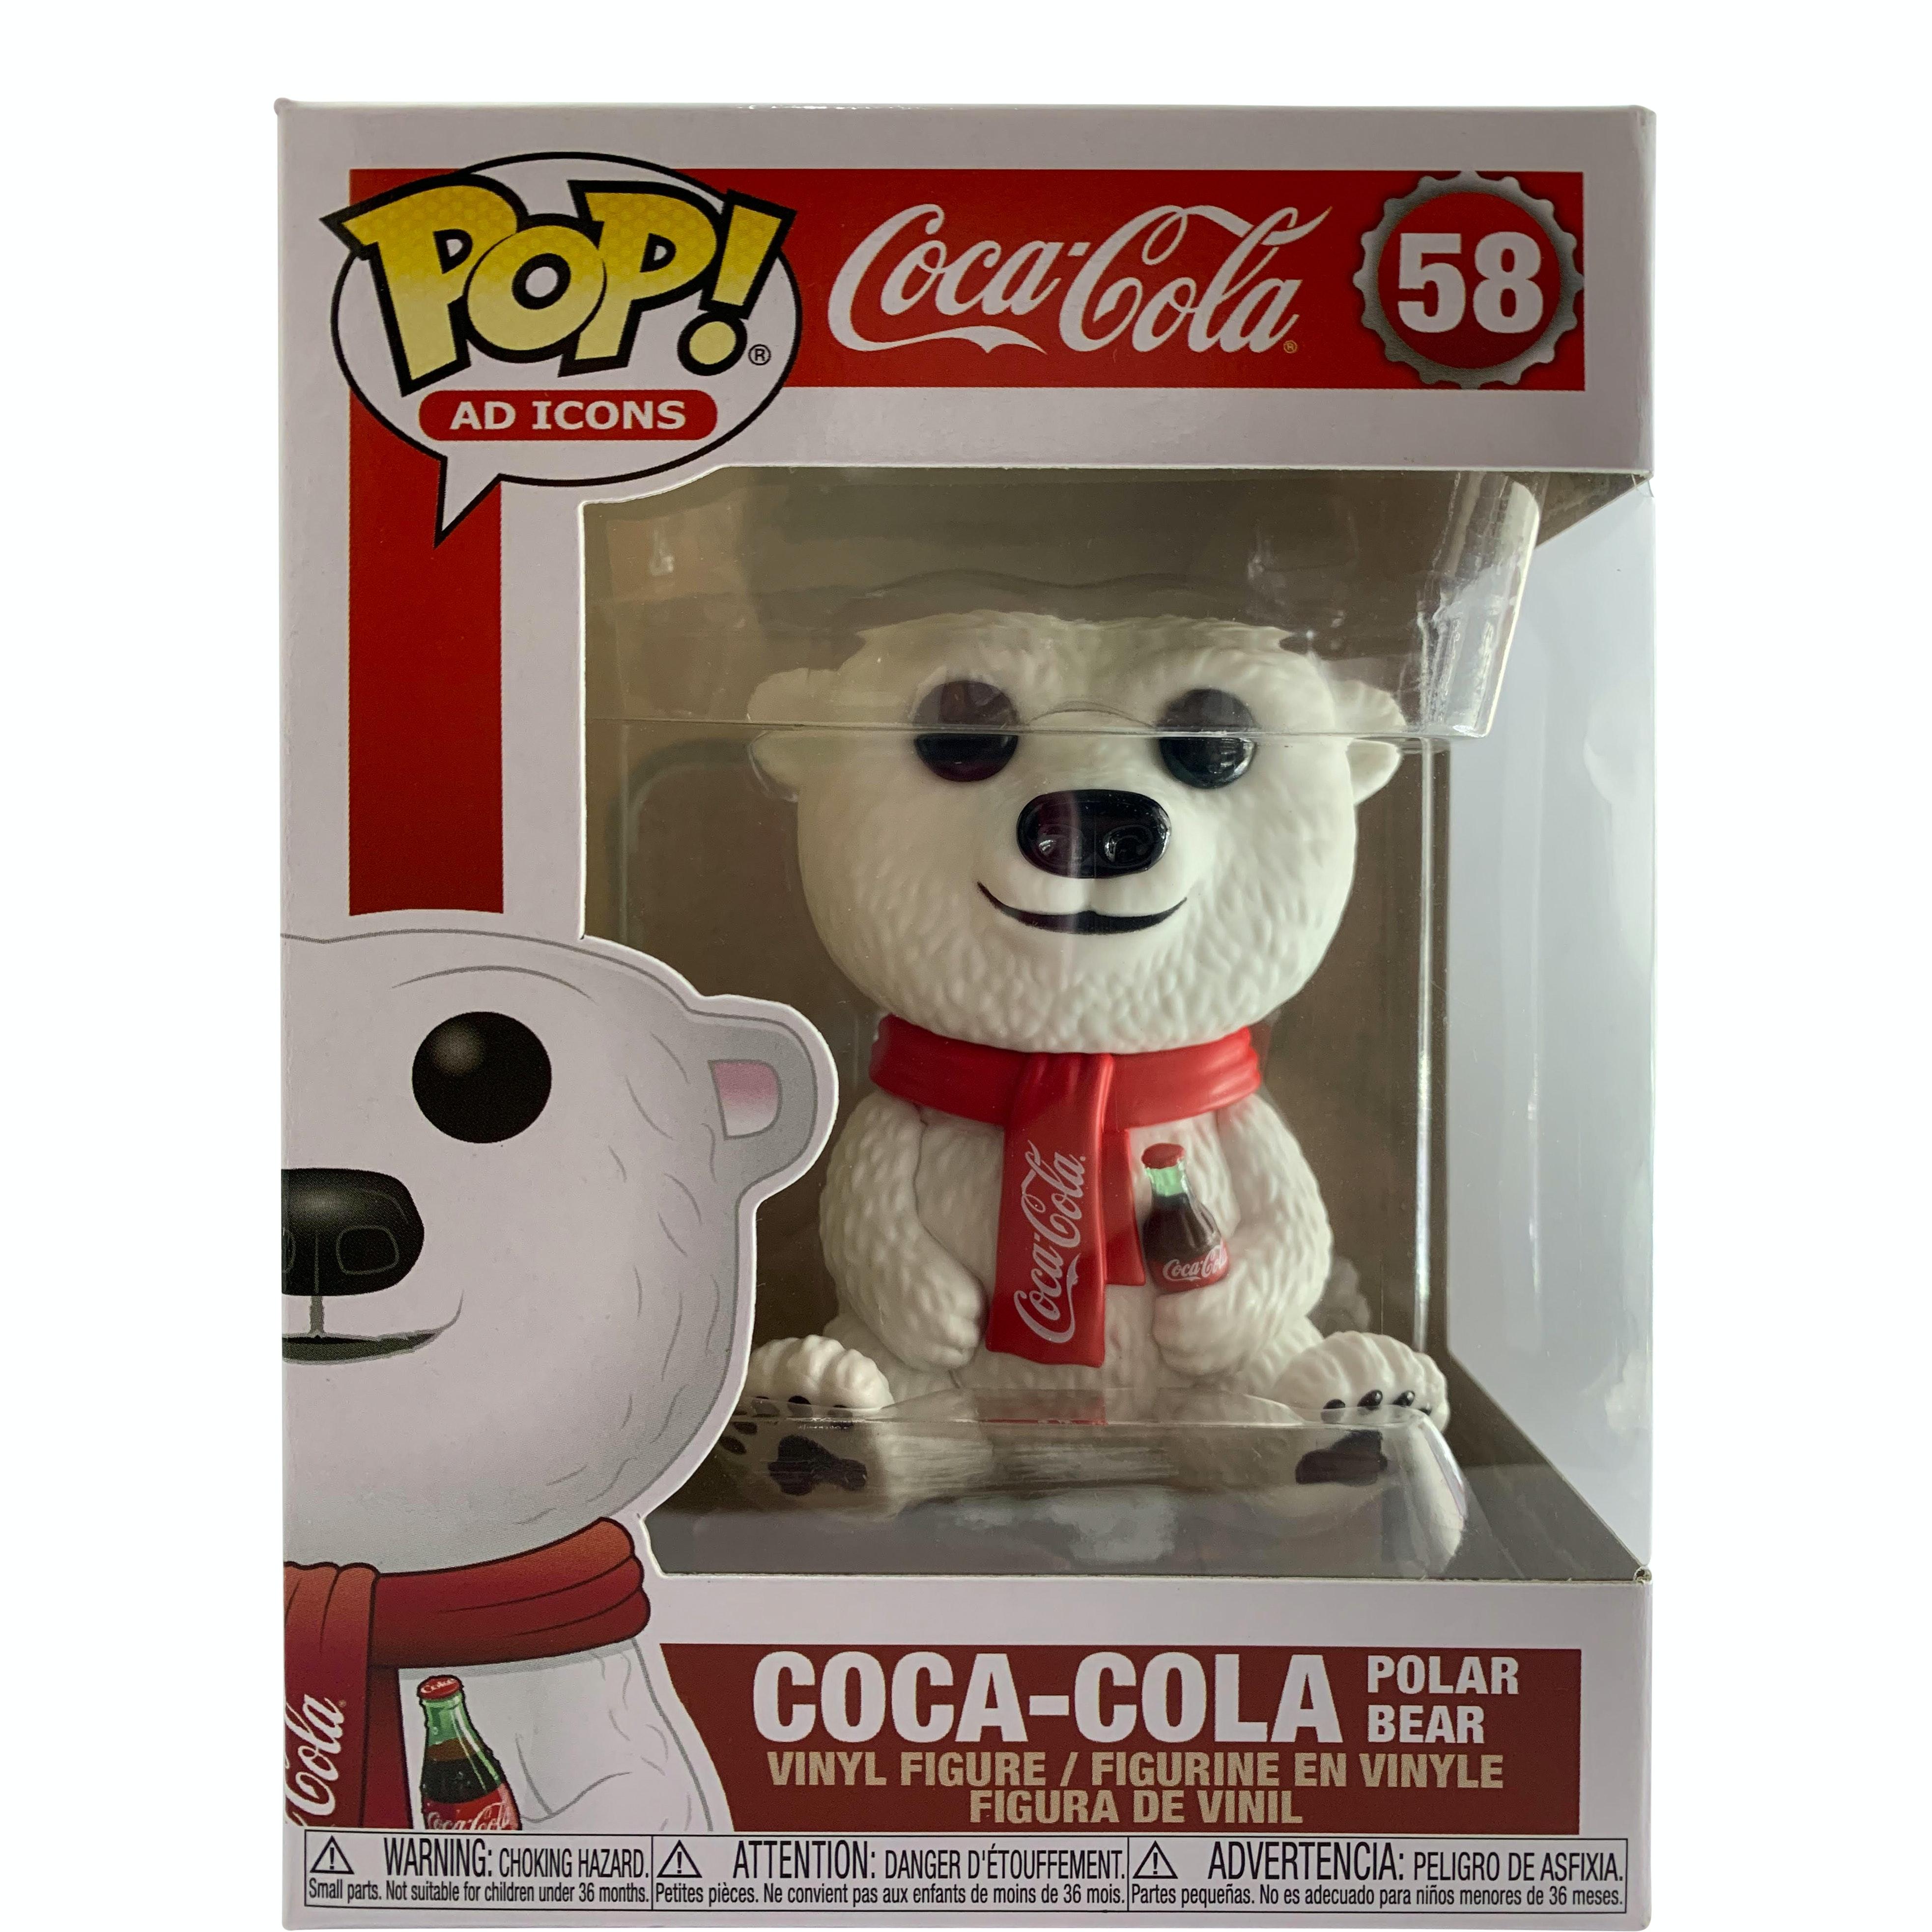 Funko Pop Ad Icons Coca Cola Polar Bear #58 Vinyl Figure with Protector case